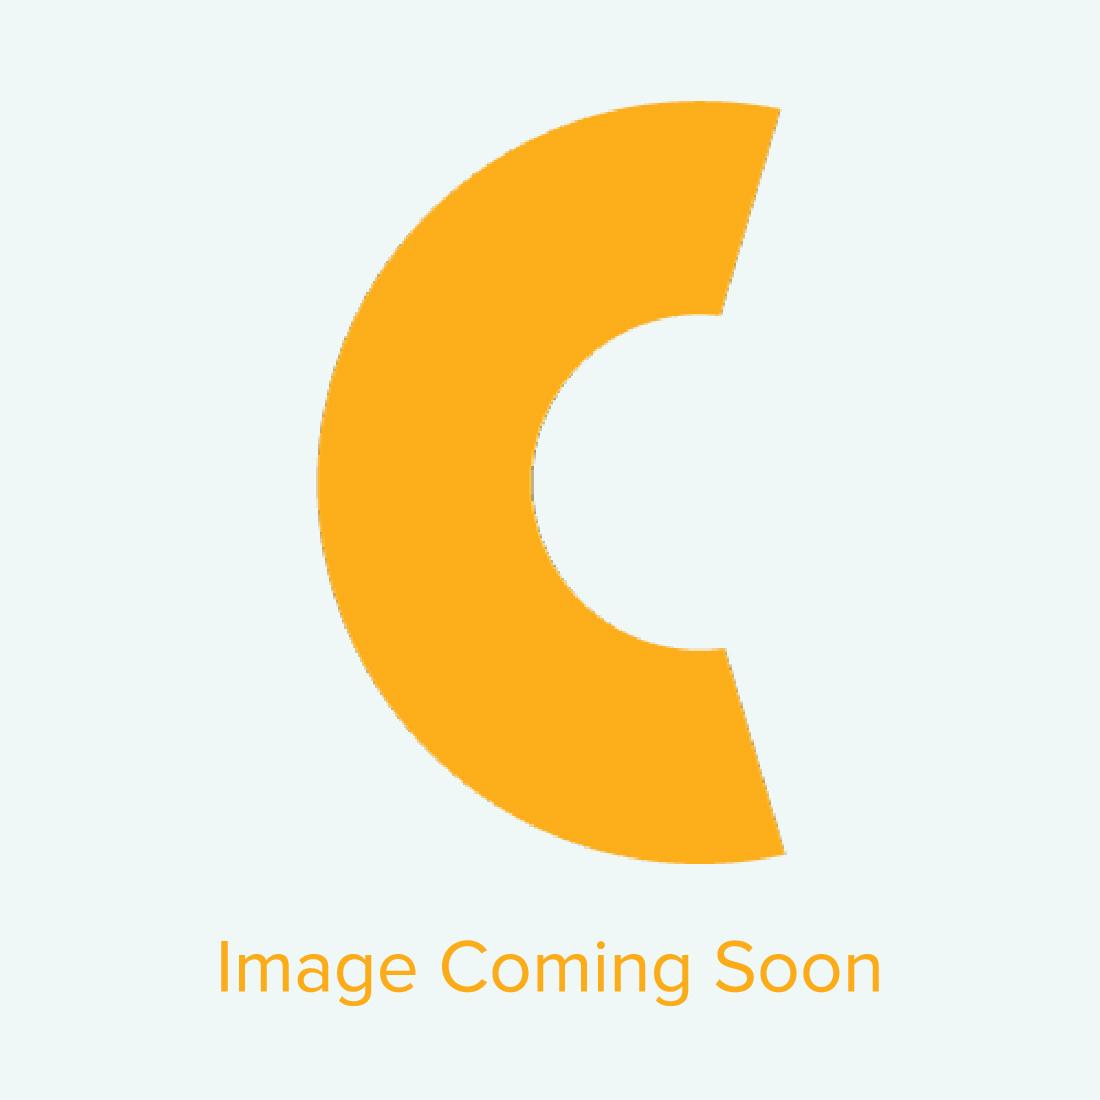 Media Catch Basket for Graphtec CE6000-120PLUS Cutter